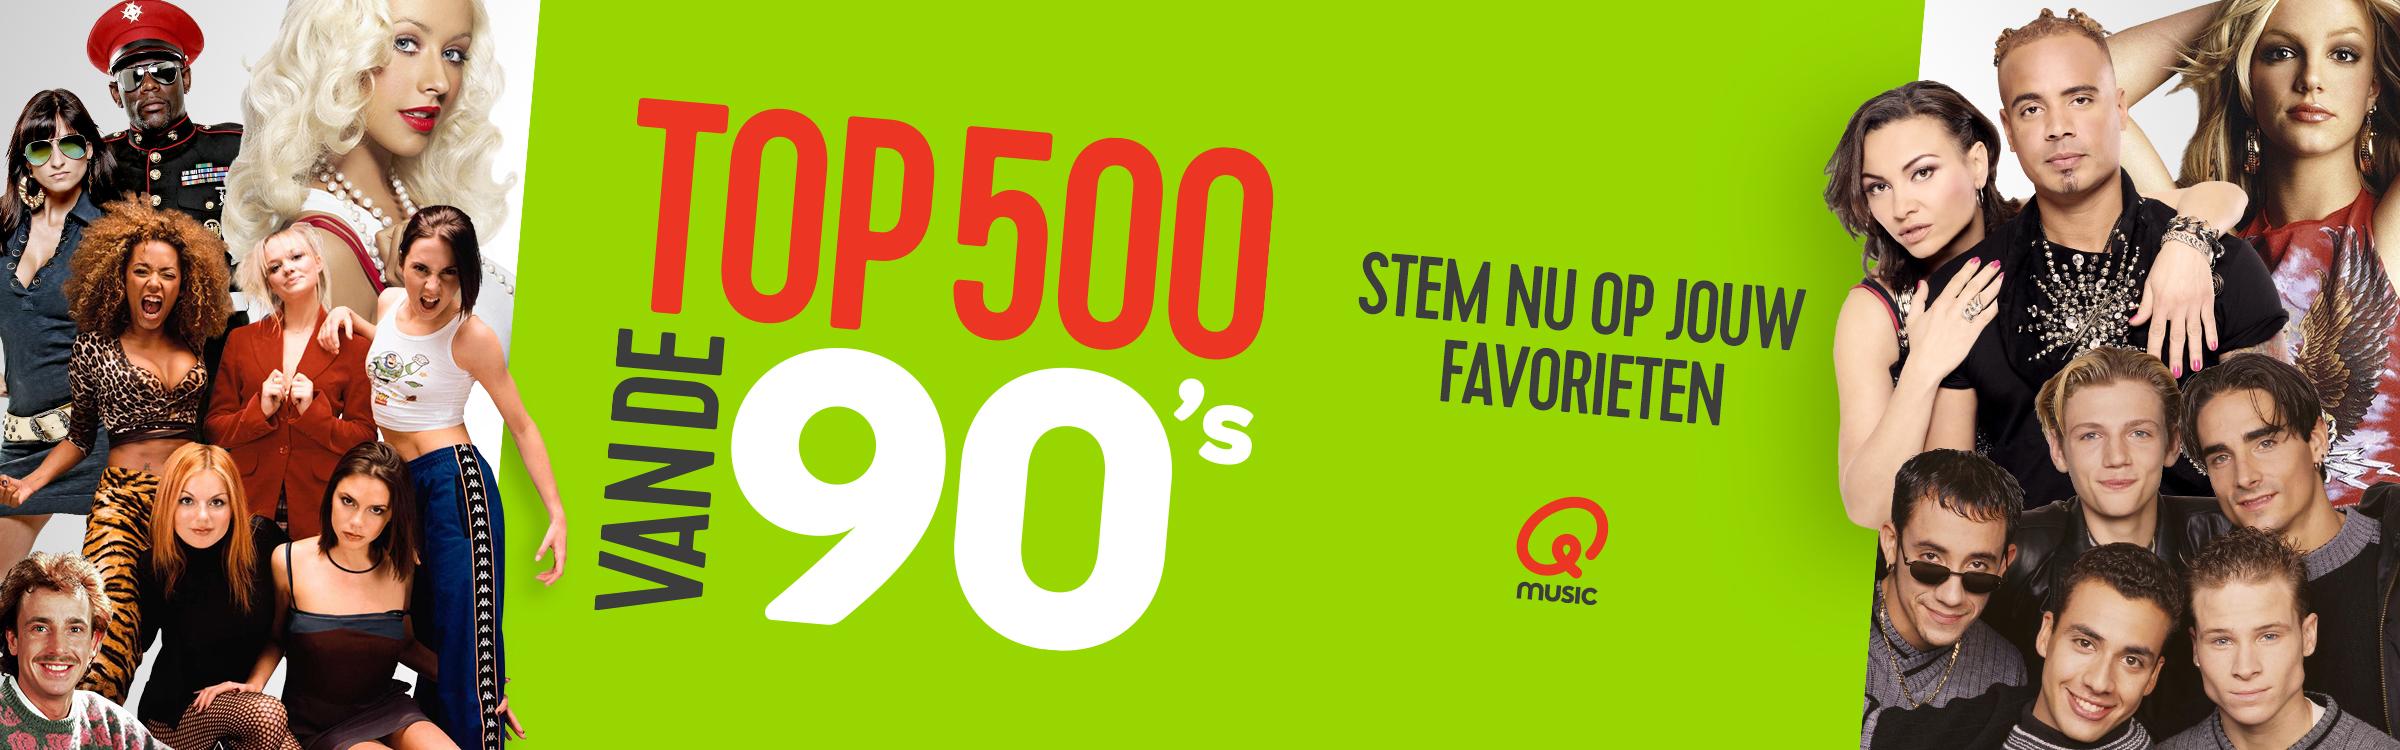 Qmusic actionheader top500 90s